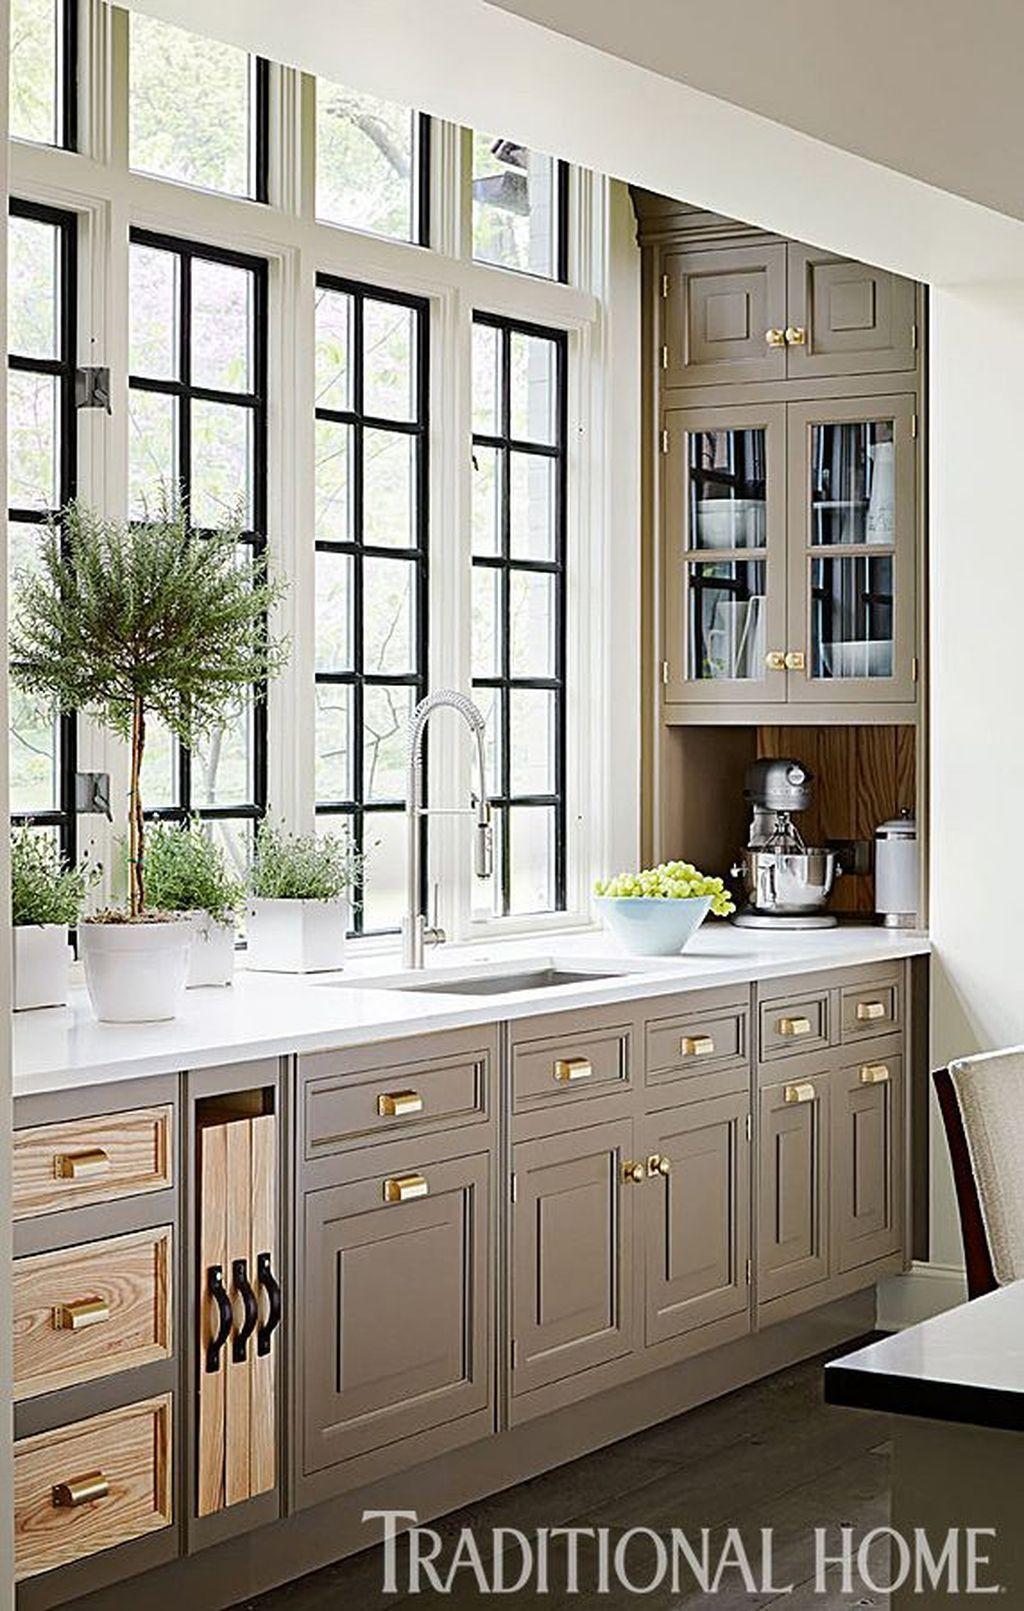 Cool Beautiful Kitchen Design Ideas 45 Traditional Kitchen Design Taupe Kitchen Cabinets Taupe Kitchen